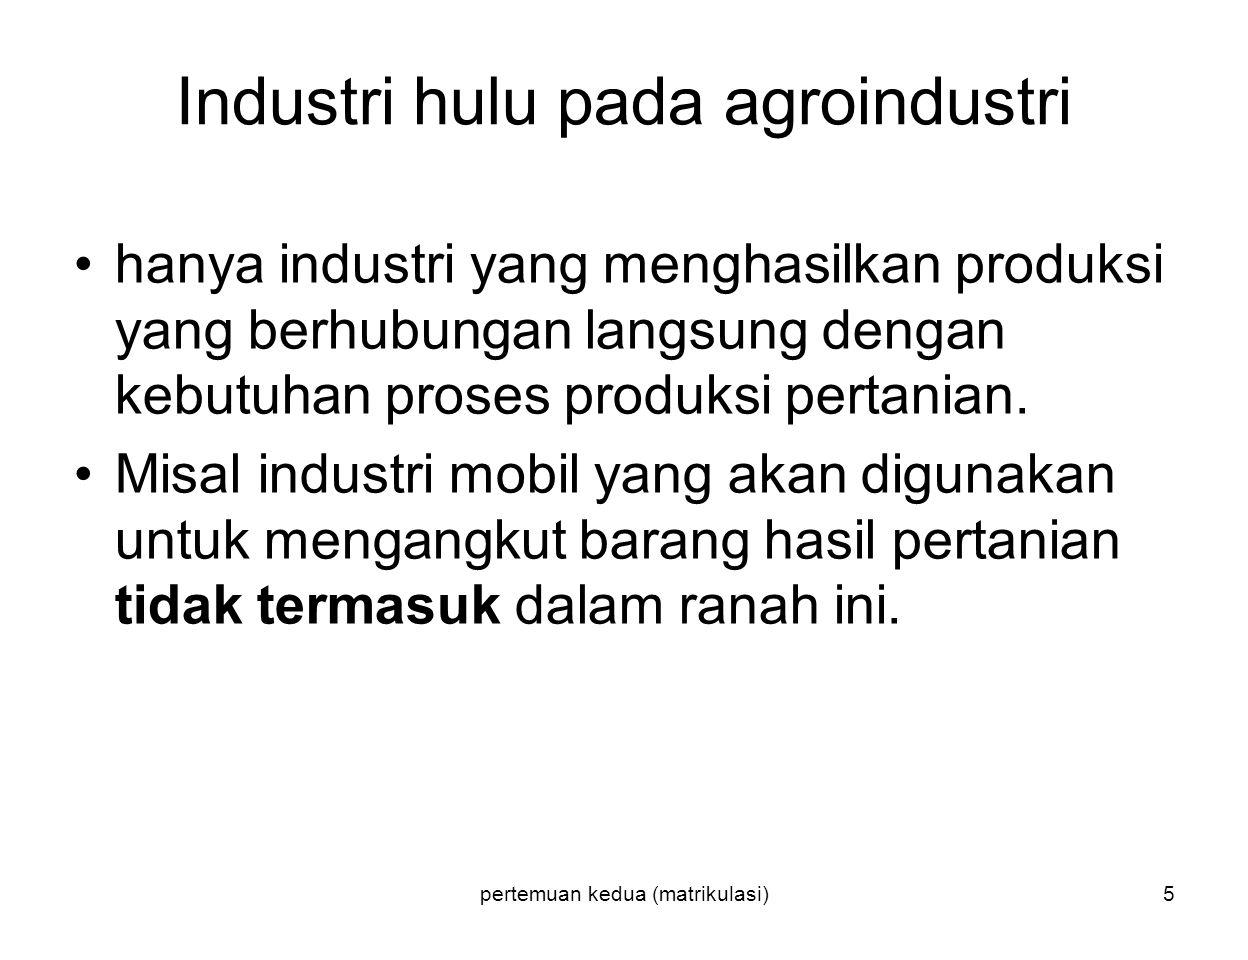 Industri hulu pada agroindustri